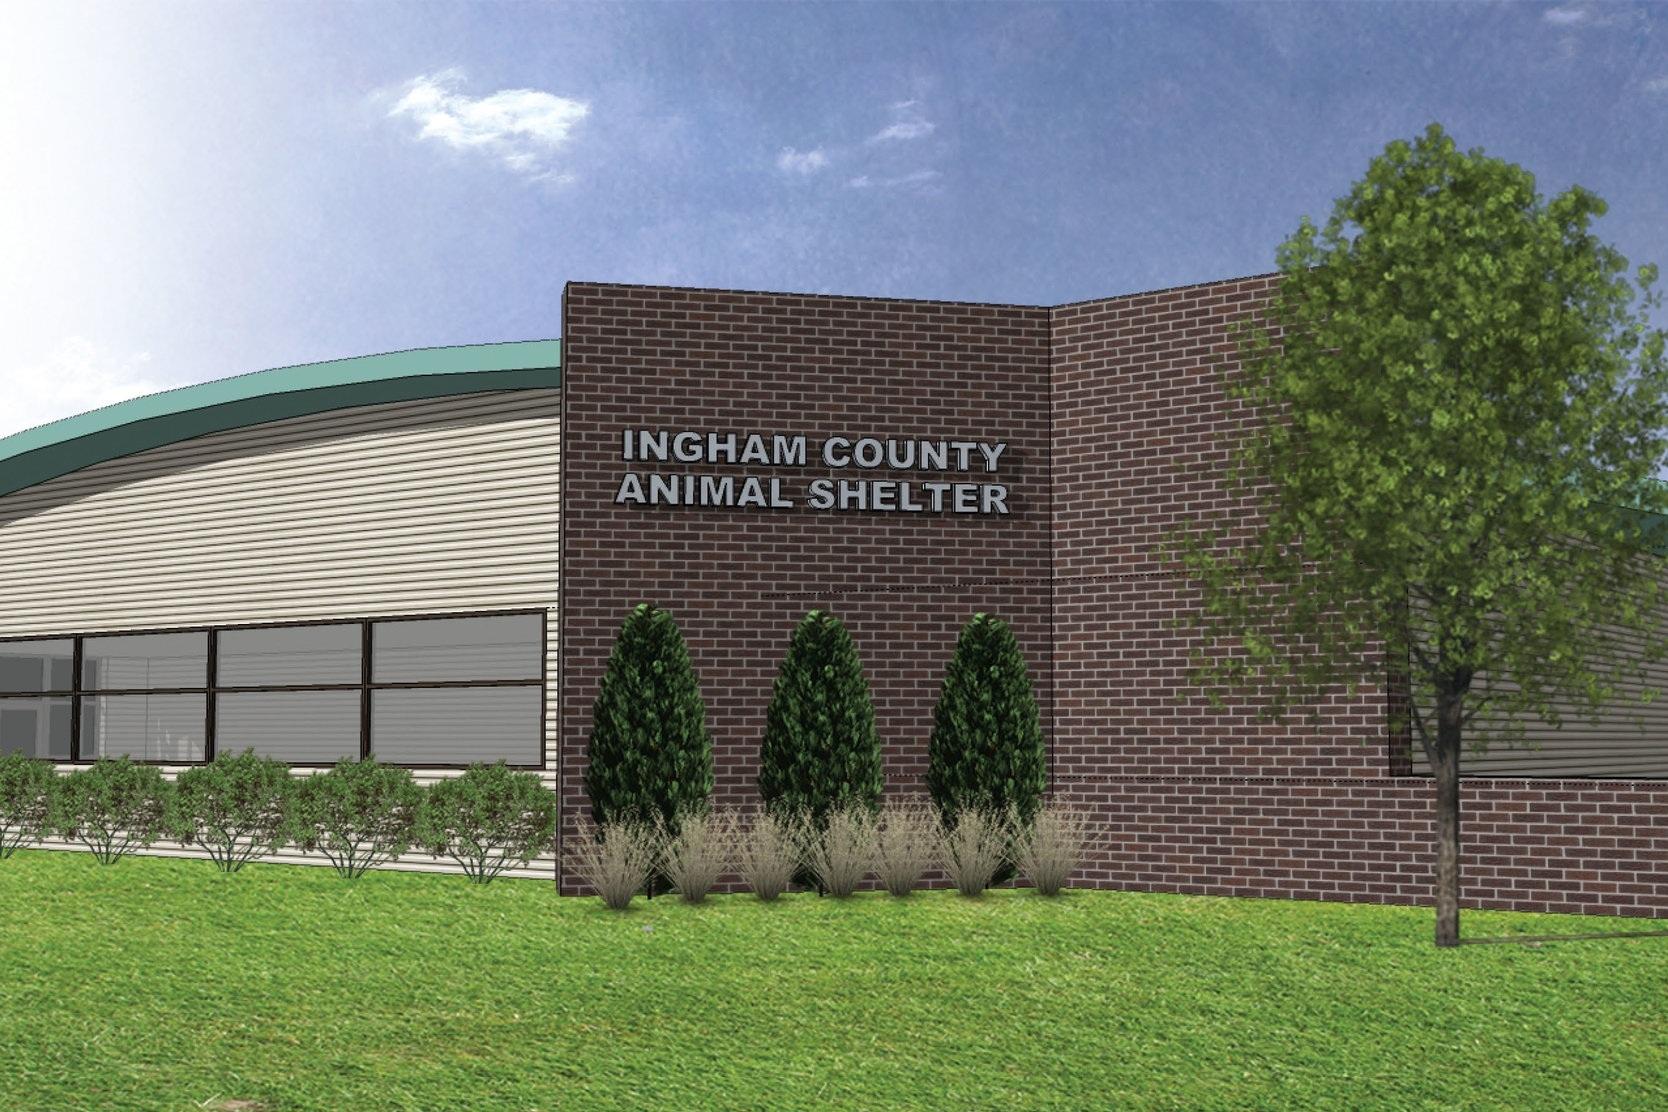 Ingham County Animal Shelter